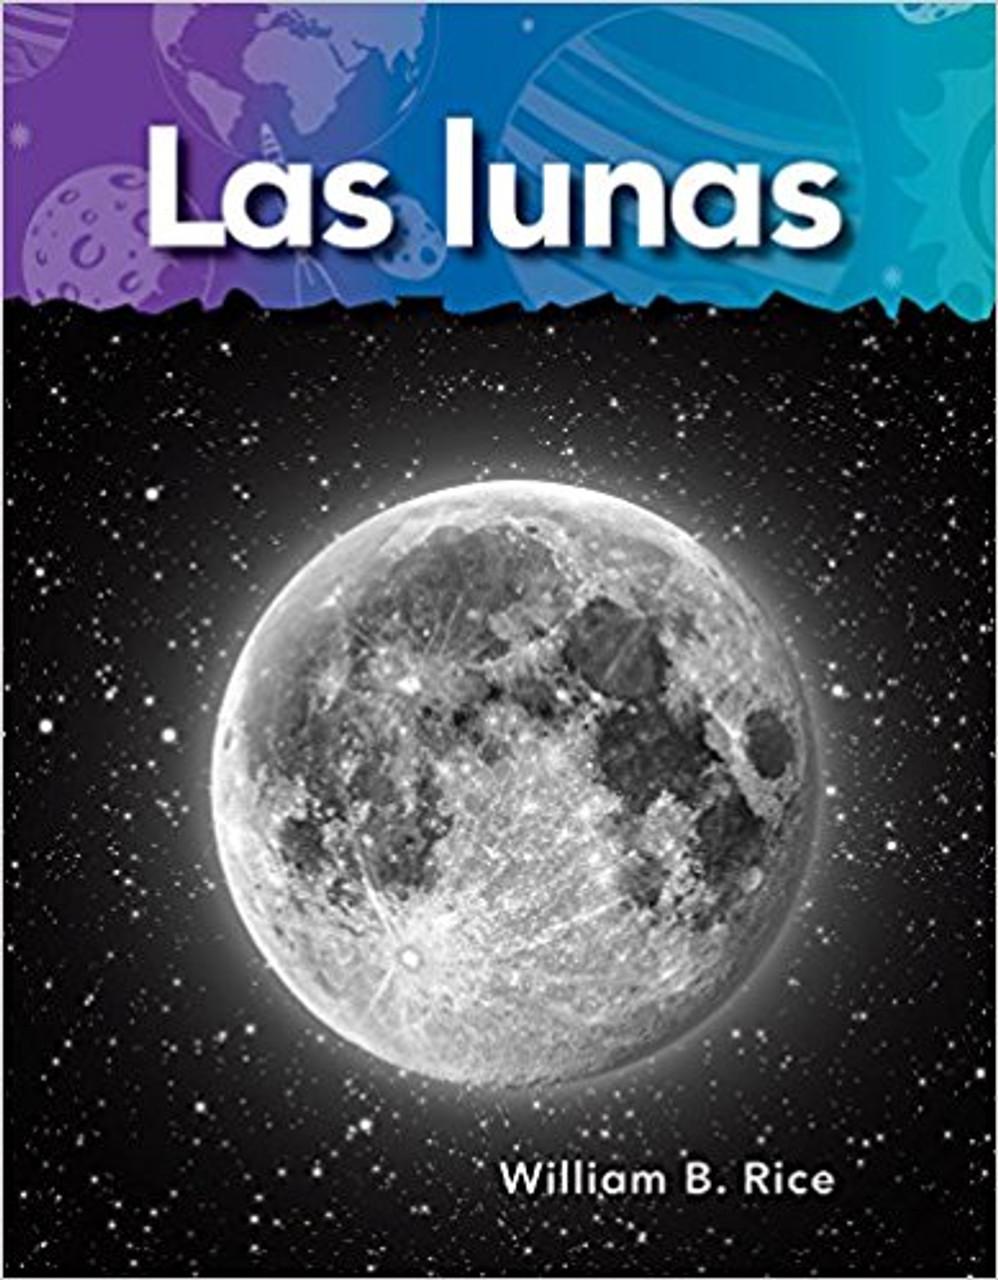 Las lunas (Moons) by William B Rice